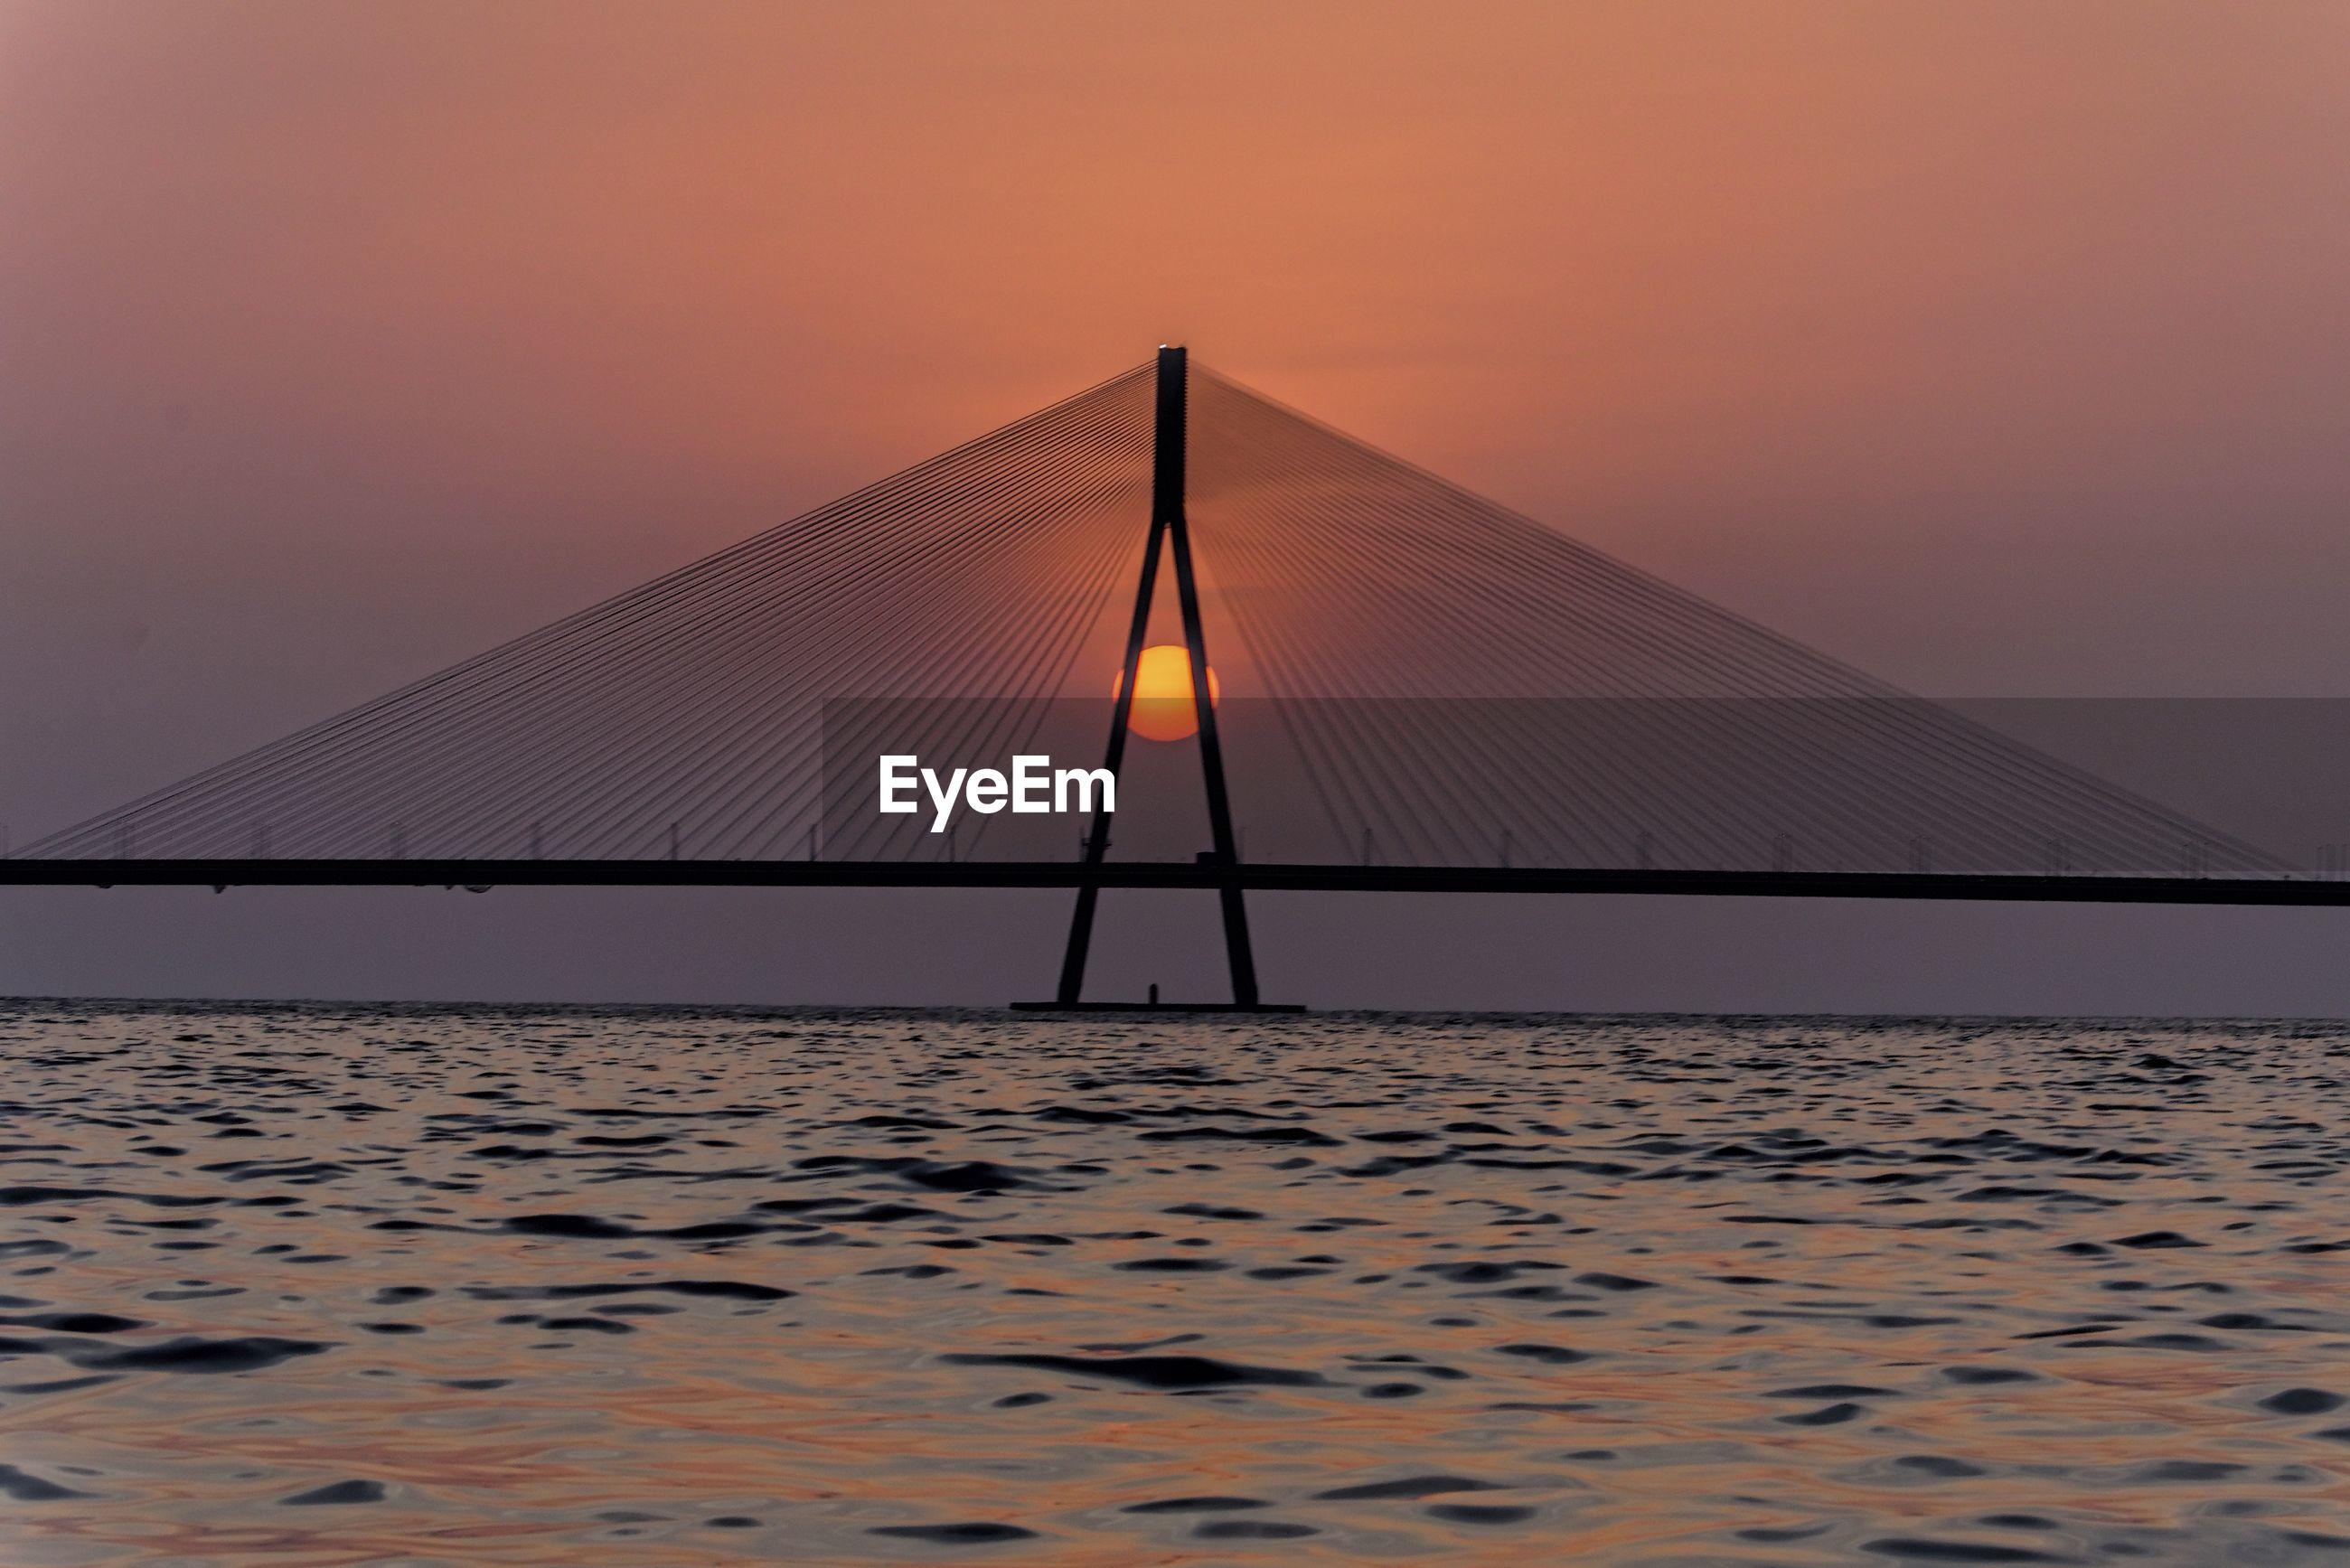 SILHOUETTE BRIDGE BY SEA AGAINST ORANGE SKY